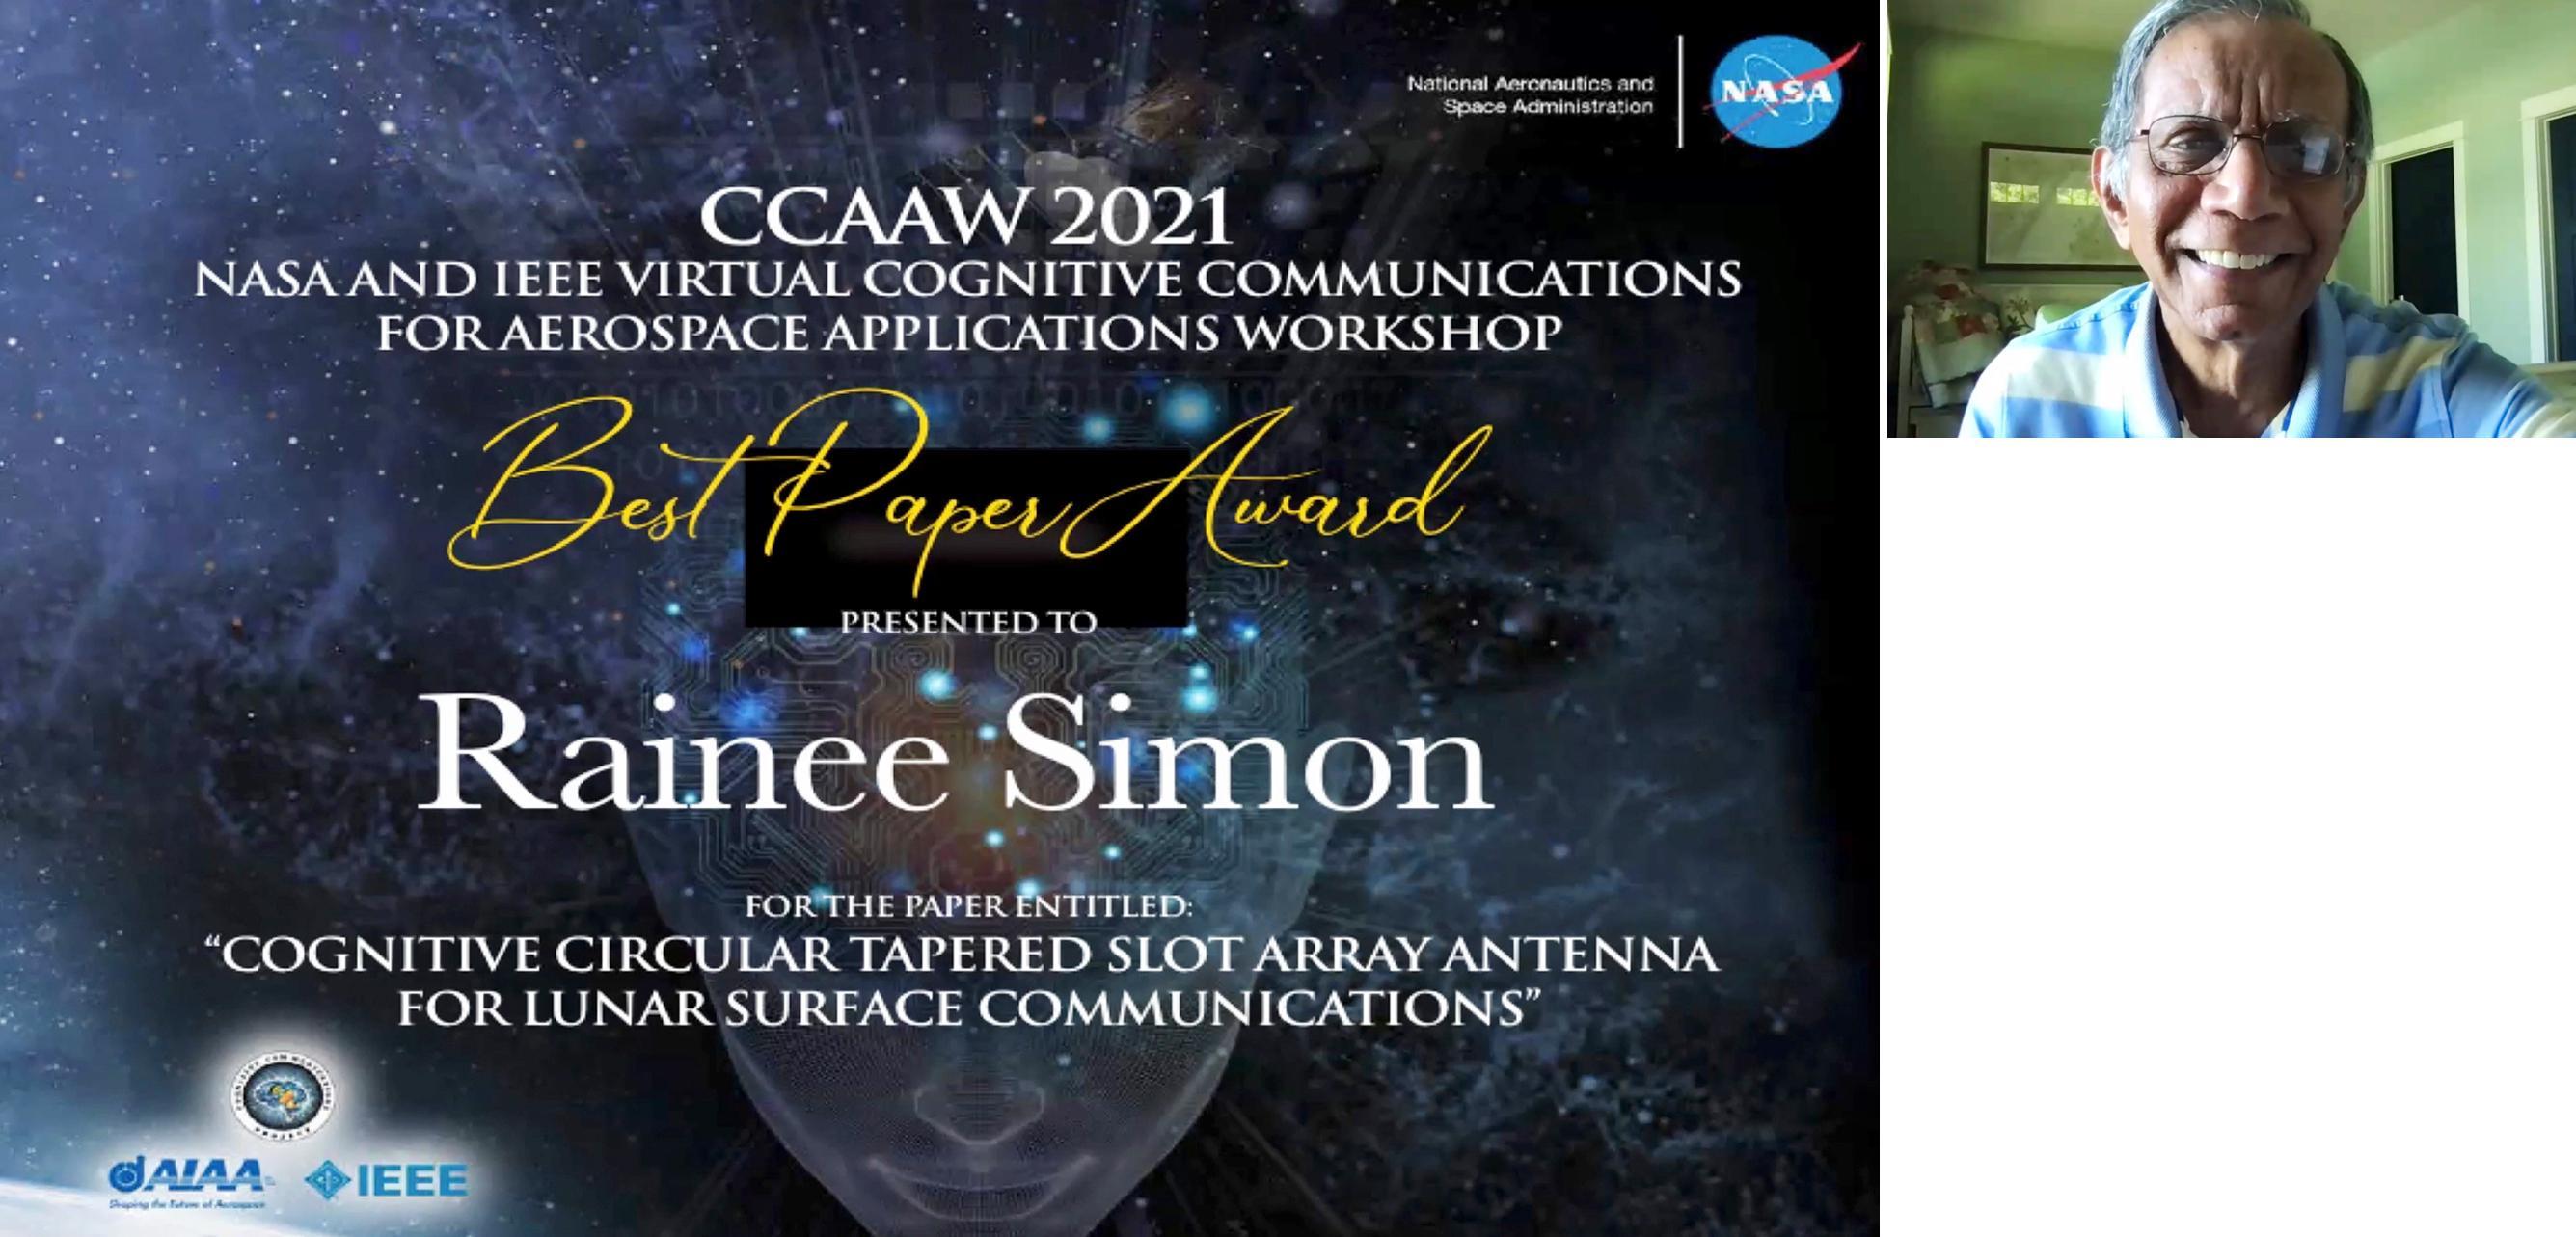 Best Paper Award to Rainee Simons